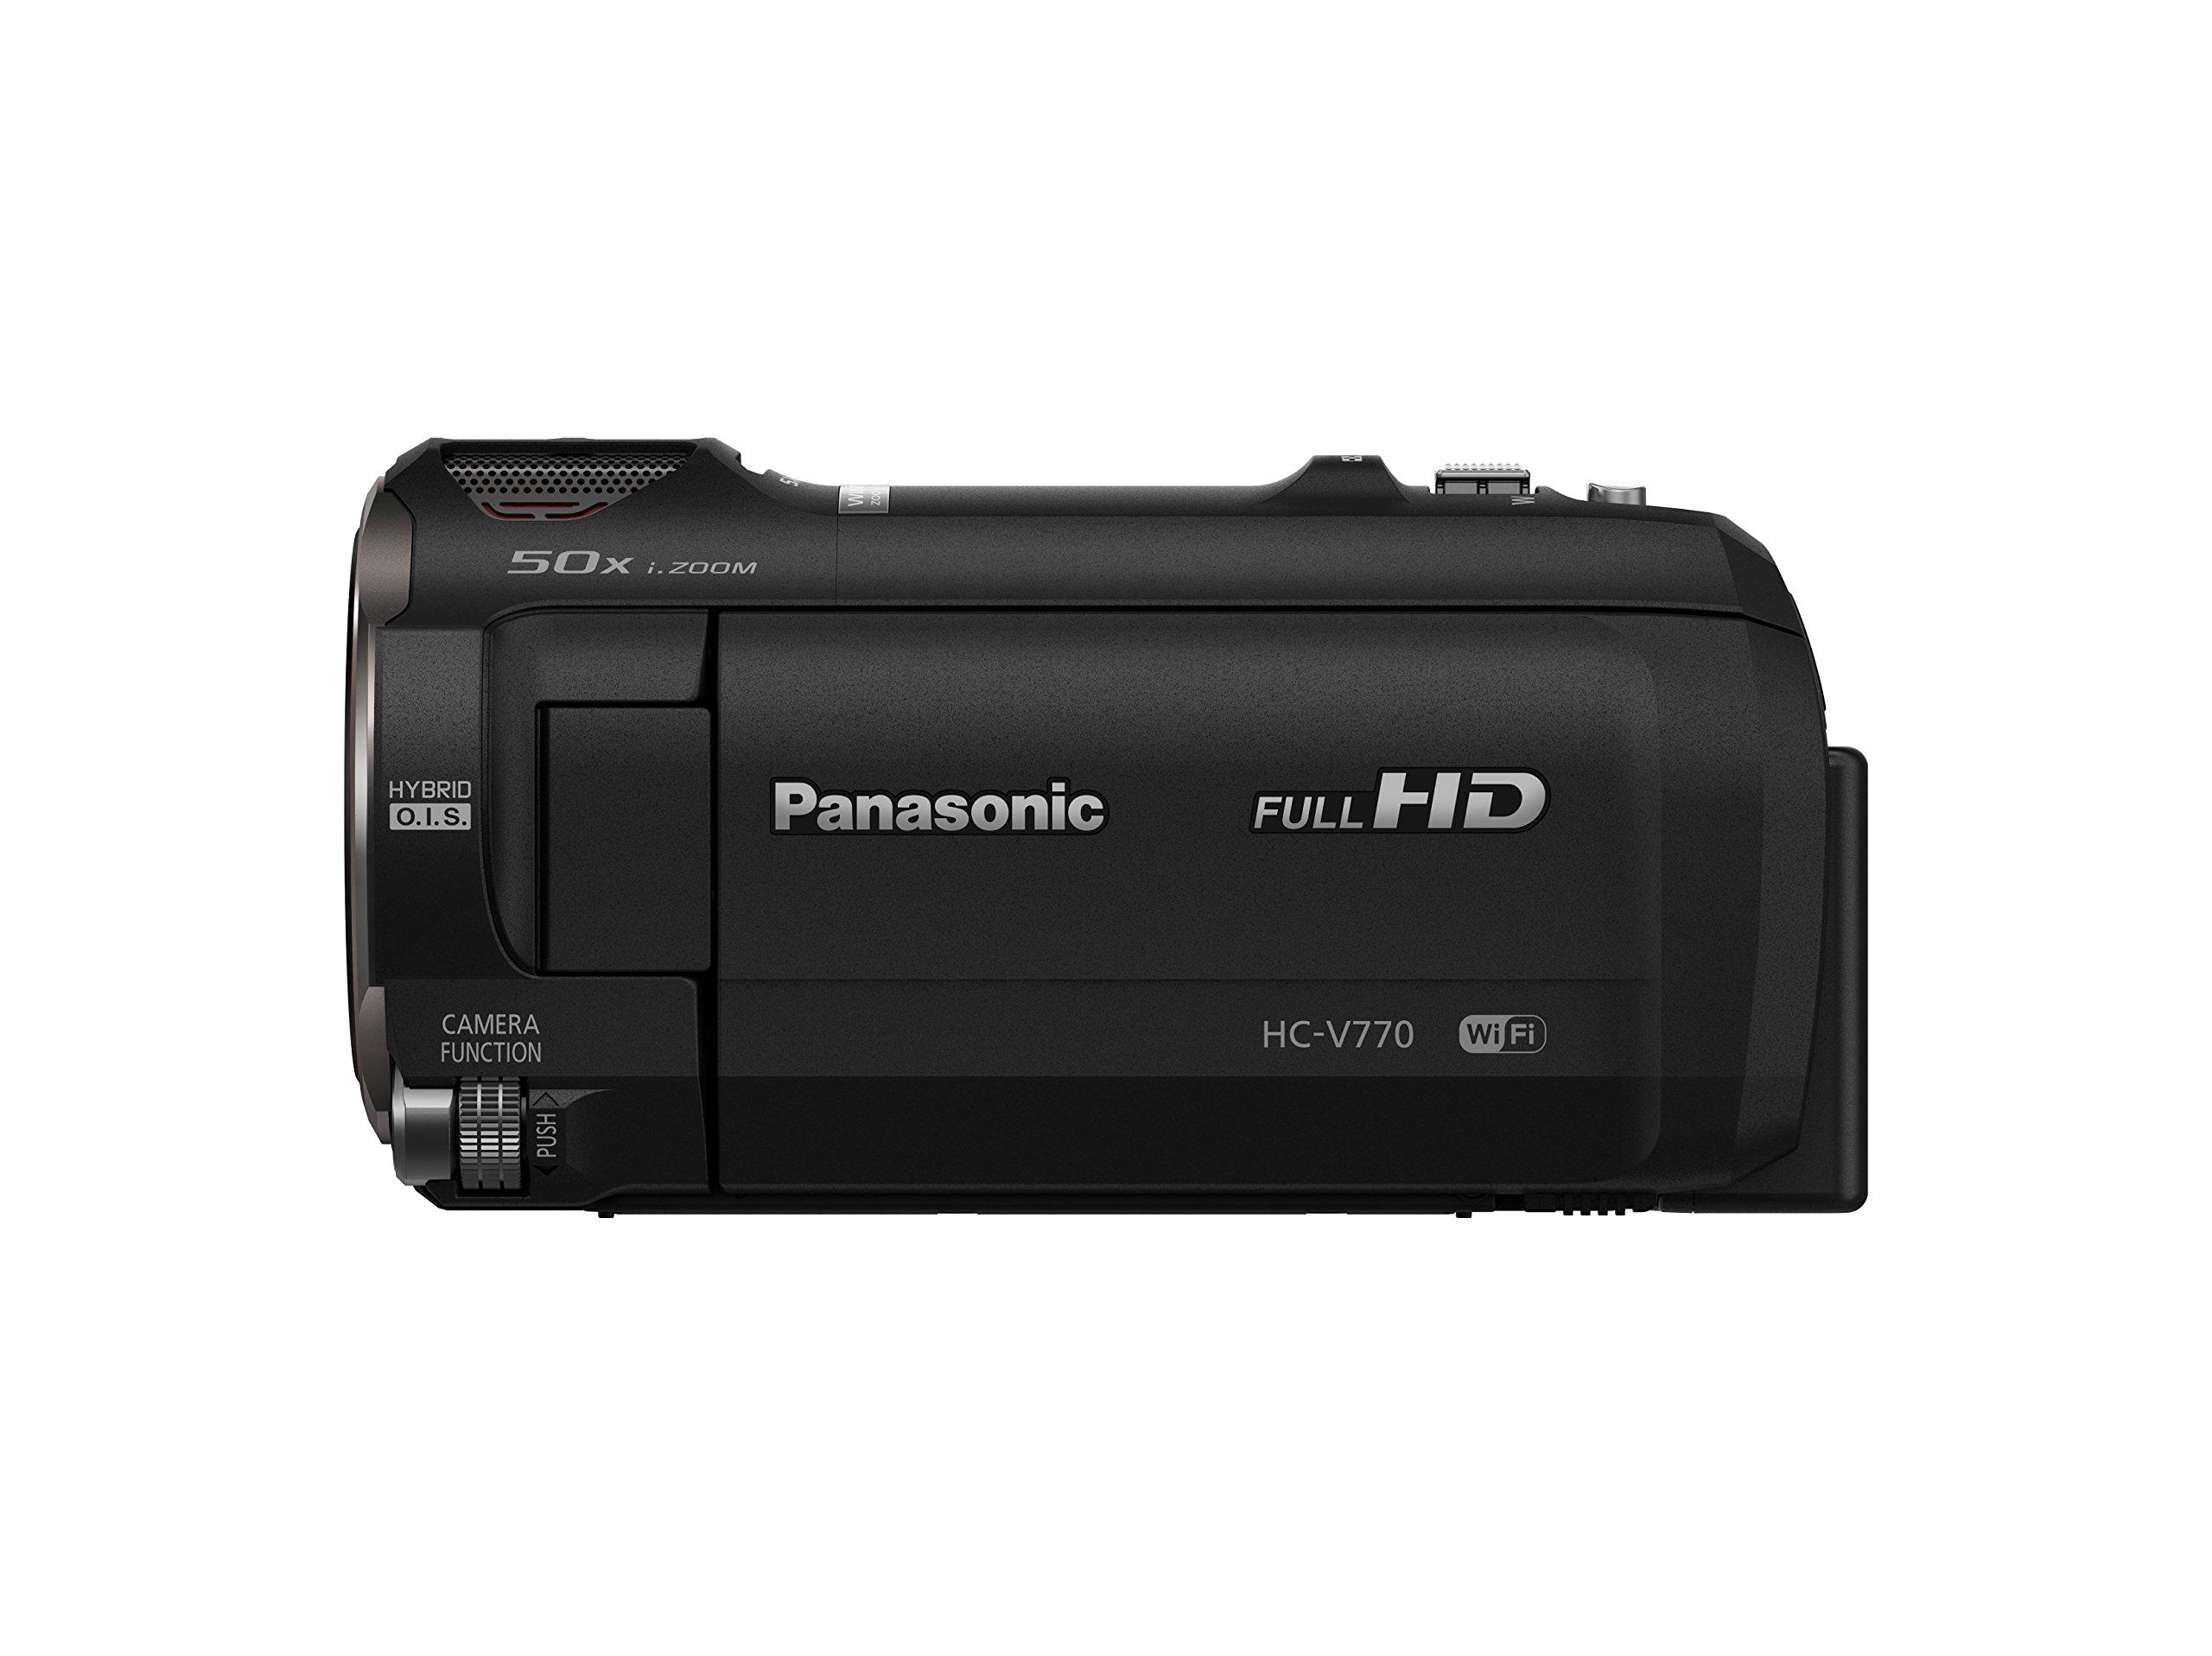 PANASONIC HC-V770 Full HD Camcorder,  20X Optical Zoom, 1/2.3'' BSI Sensor, 5-Axis Hybrid O.I.S., HDR Capture, WiFi  Smartphone Twin Video Capture (USA Black)